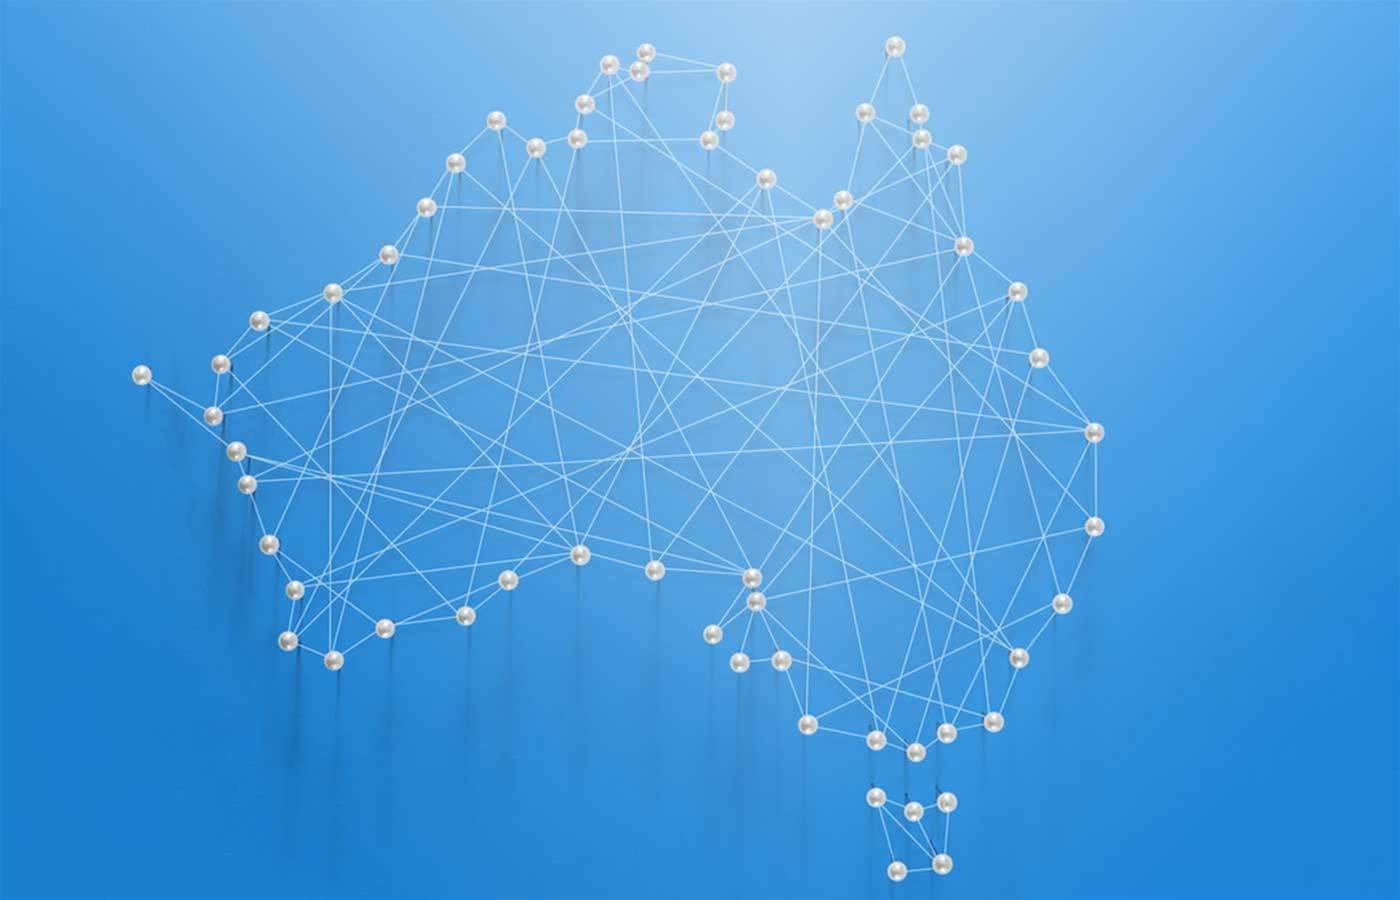 Cybersec provider lands major Leading Edge reseller deal